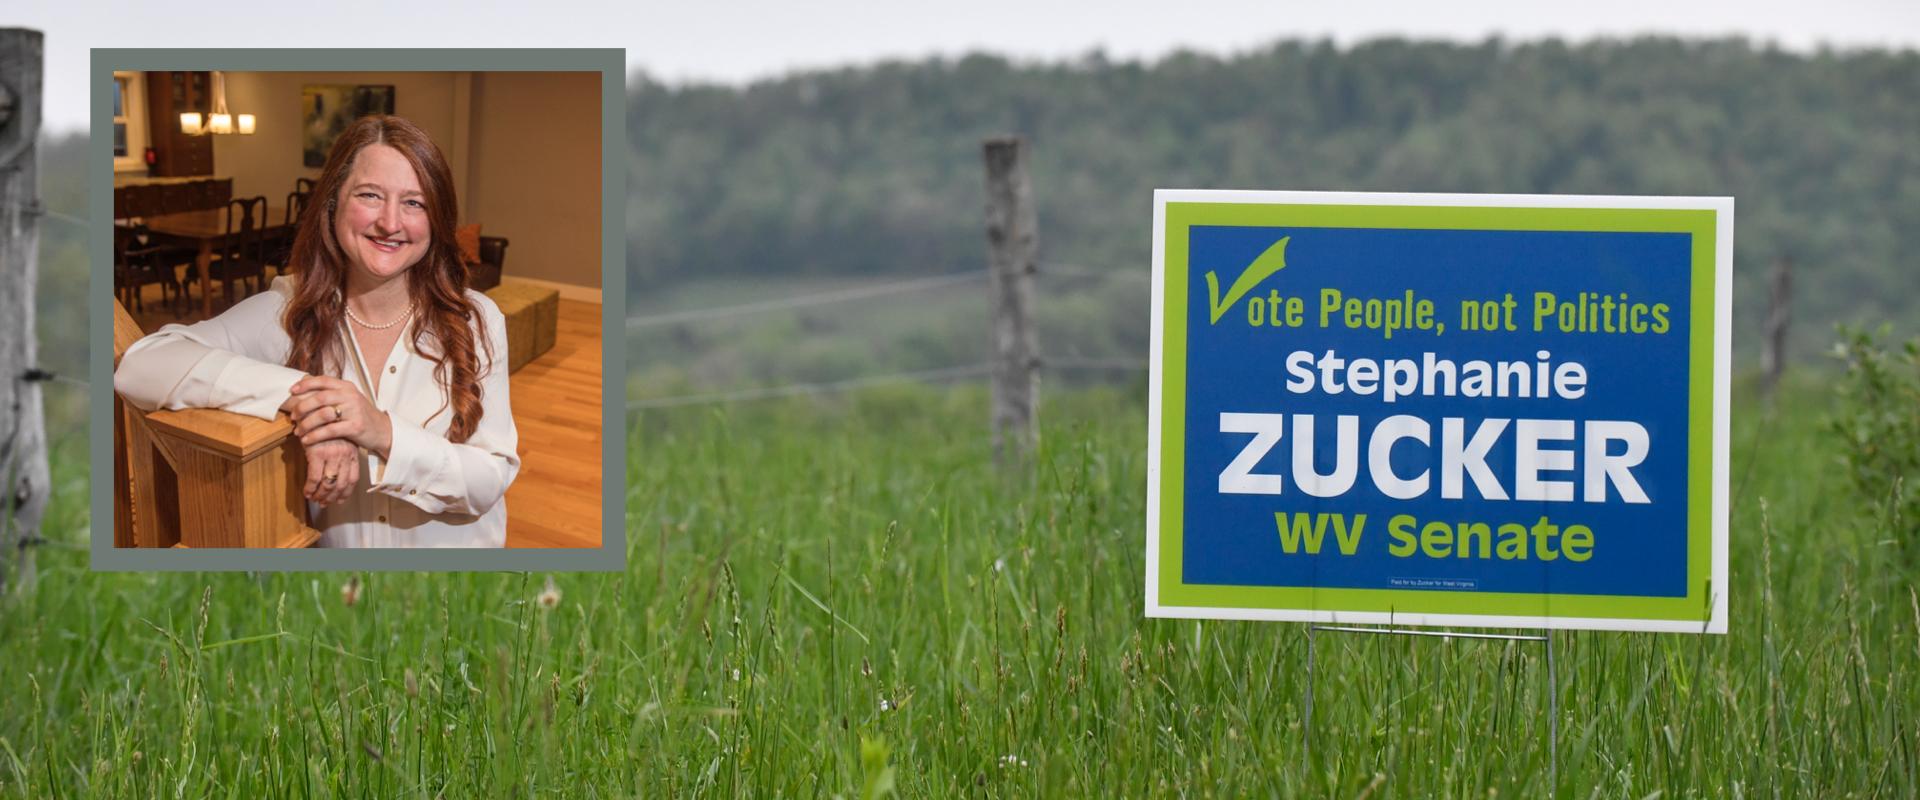 Stephanie Zucker for WV Senate